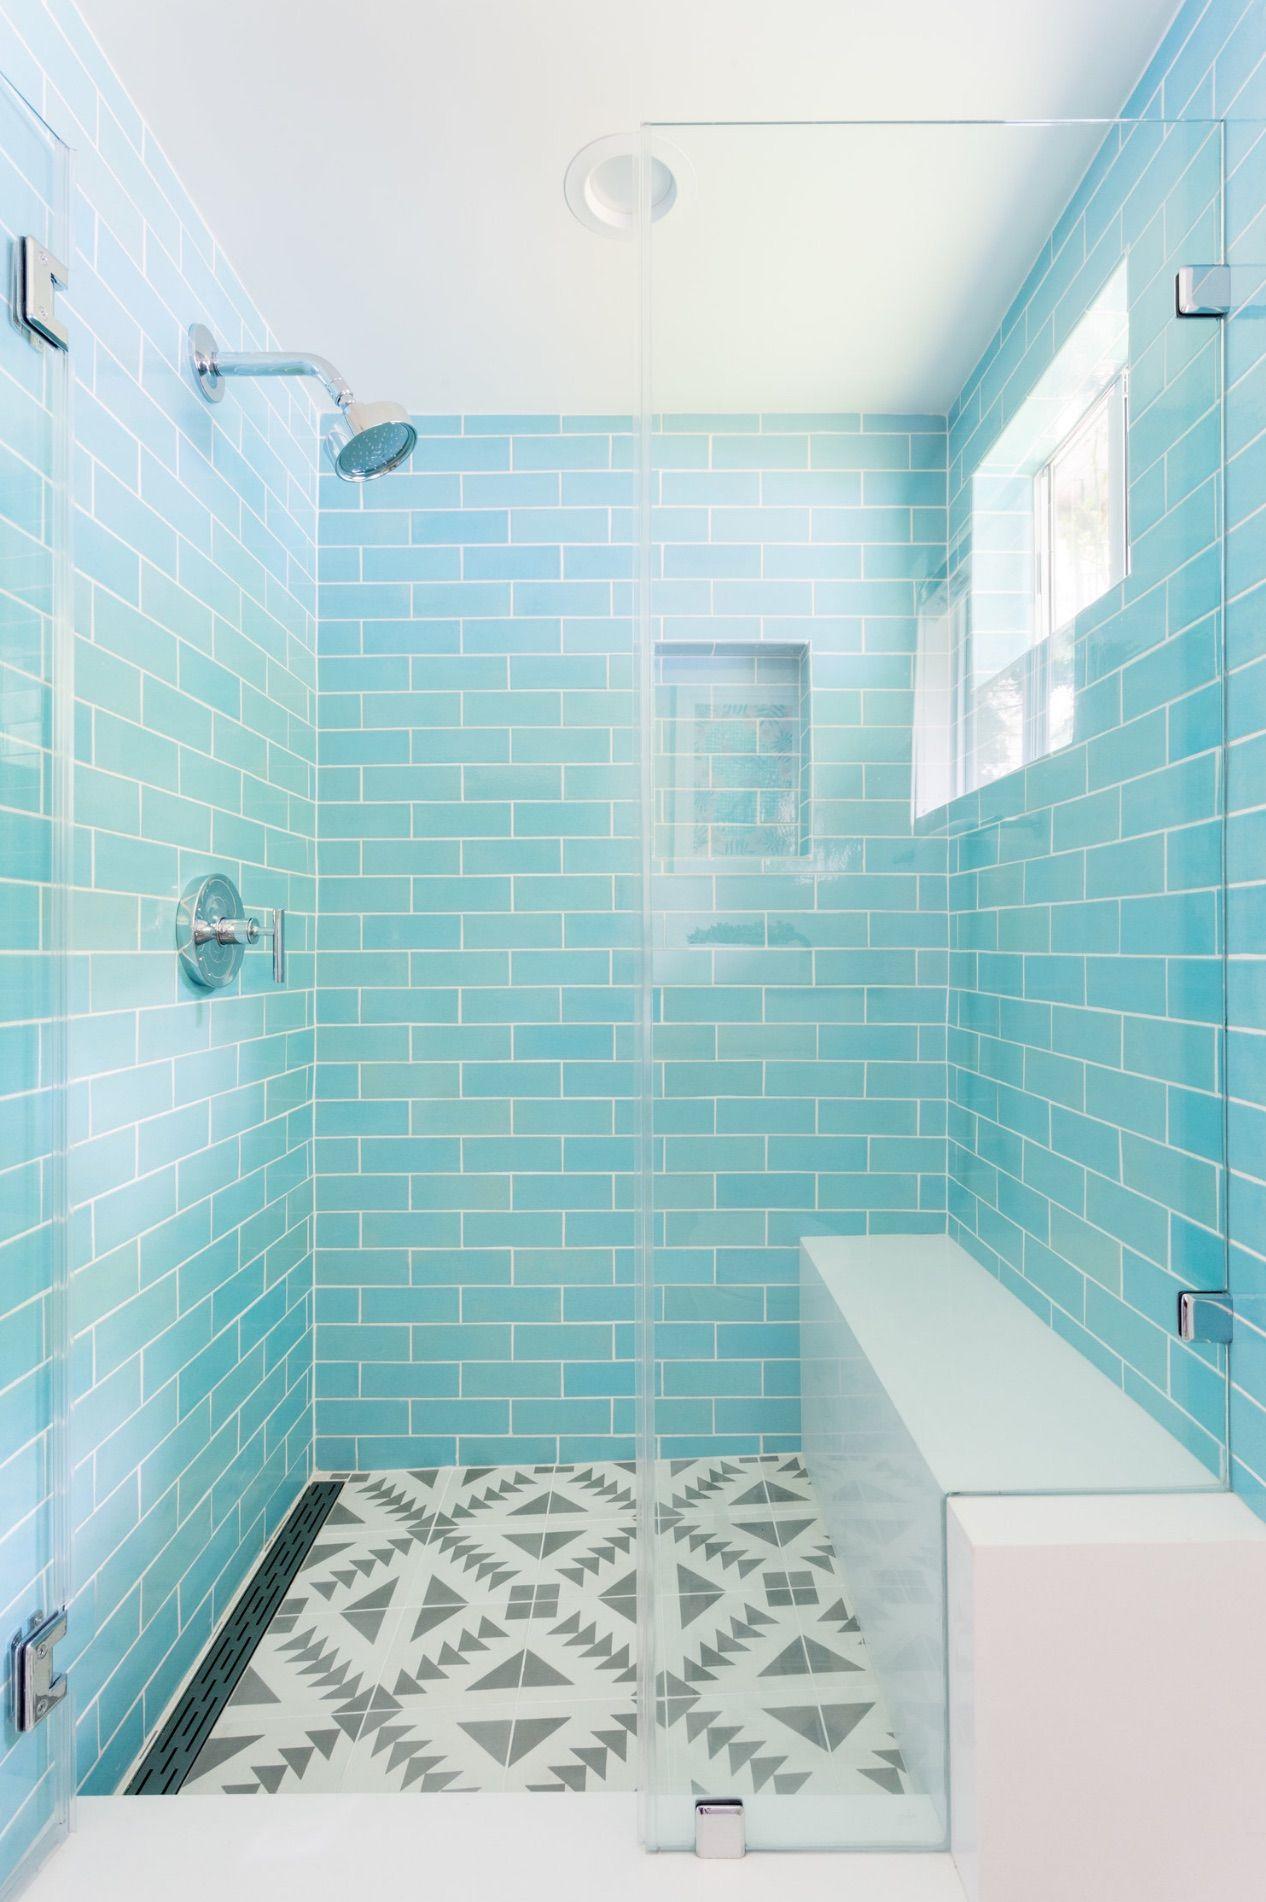 Wordpress Com In 2020 Small Bathroom Remodel Designs Bathroom Remodel Master Bathroom Remodel Shower